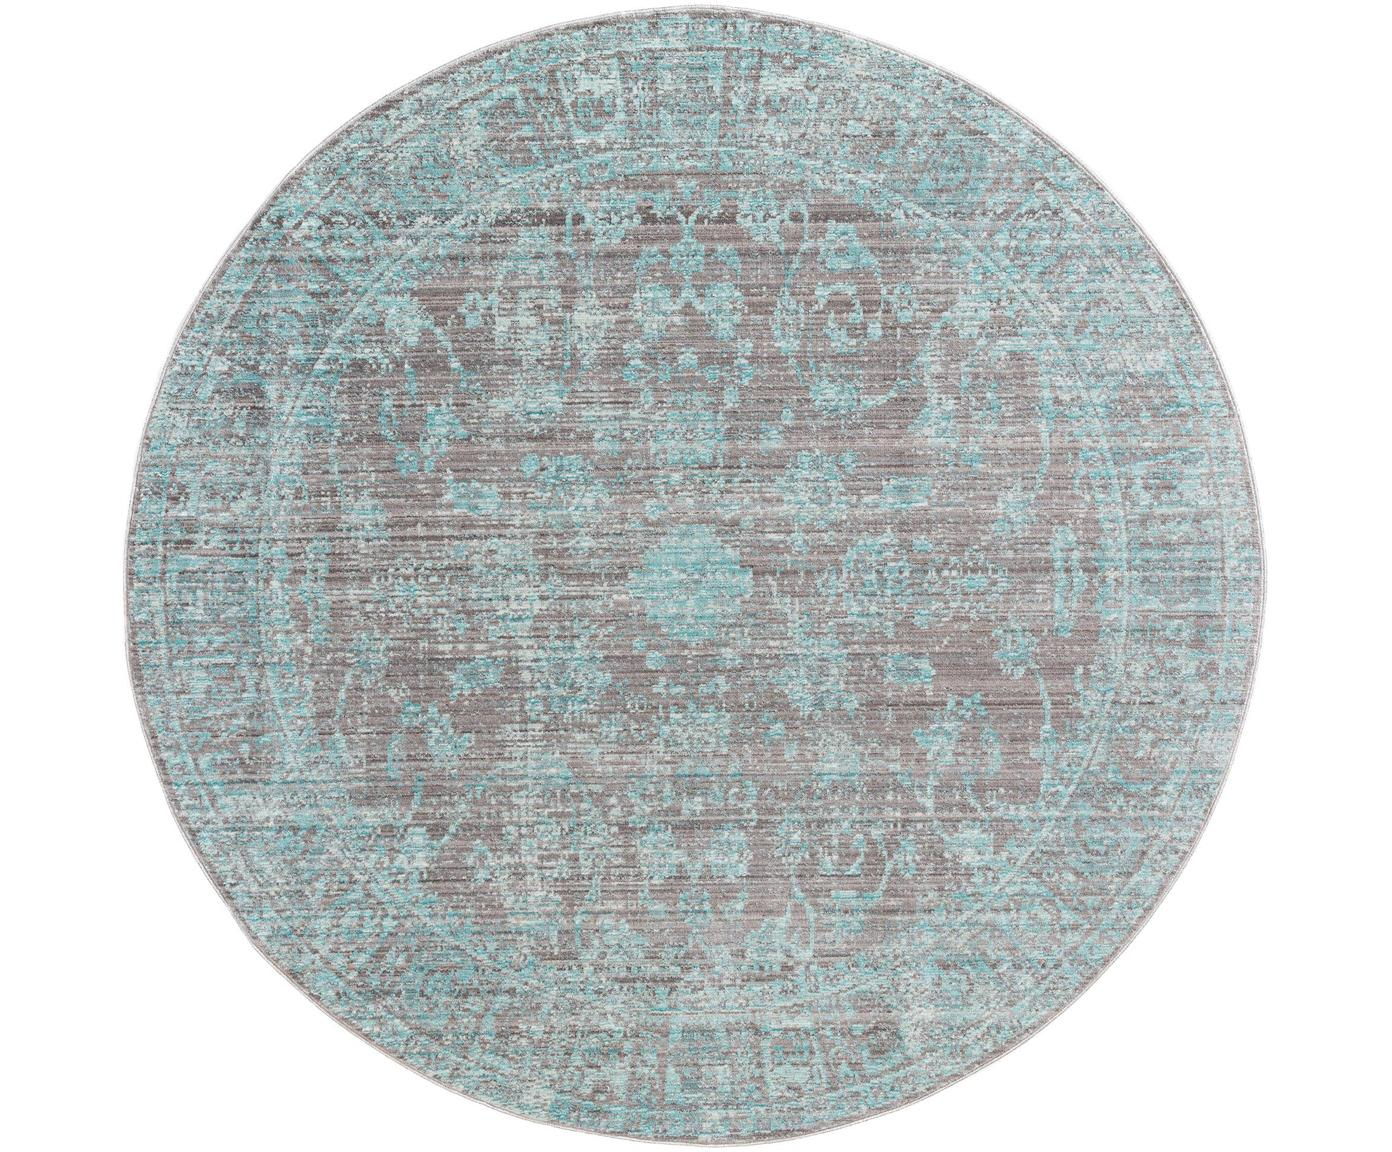 Runder Teppich Visconti im Vintage Style, Flor: Polyester, Türkis, Grau, Ø 180 cm (Größe L)